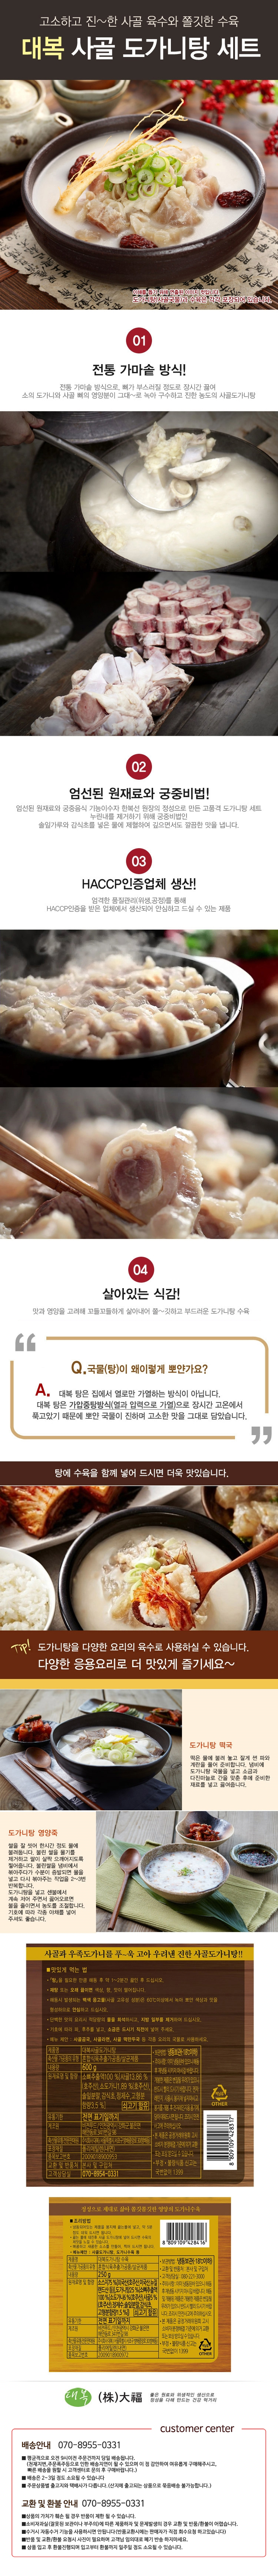 db-stew2_web.jpg